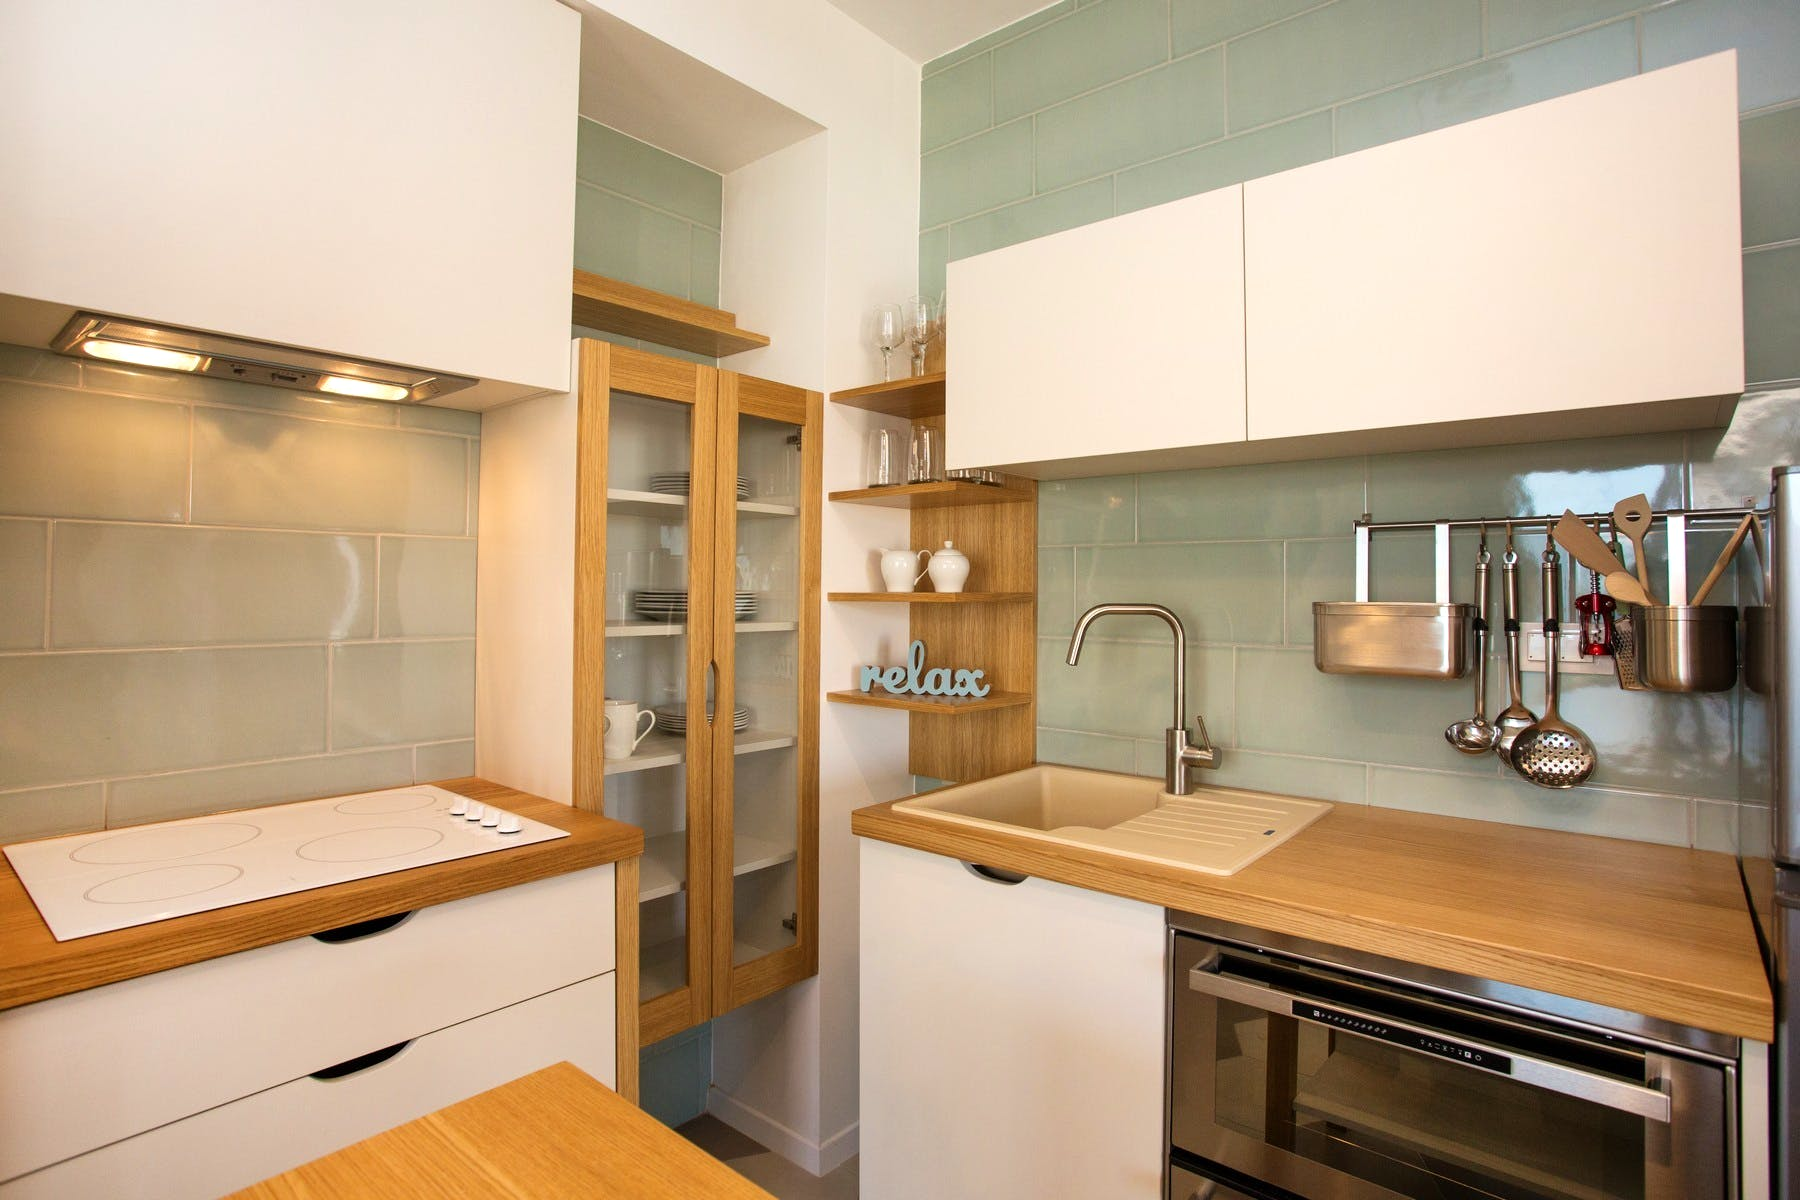 Fully fittet kitchen